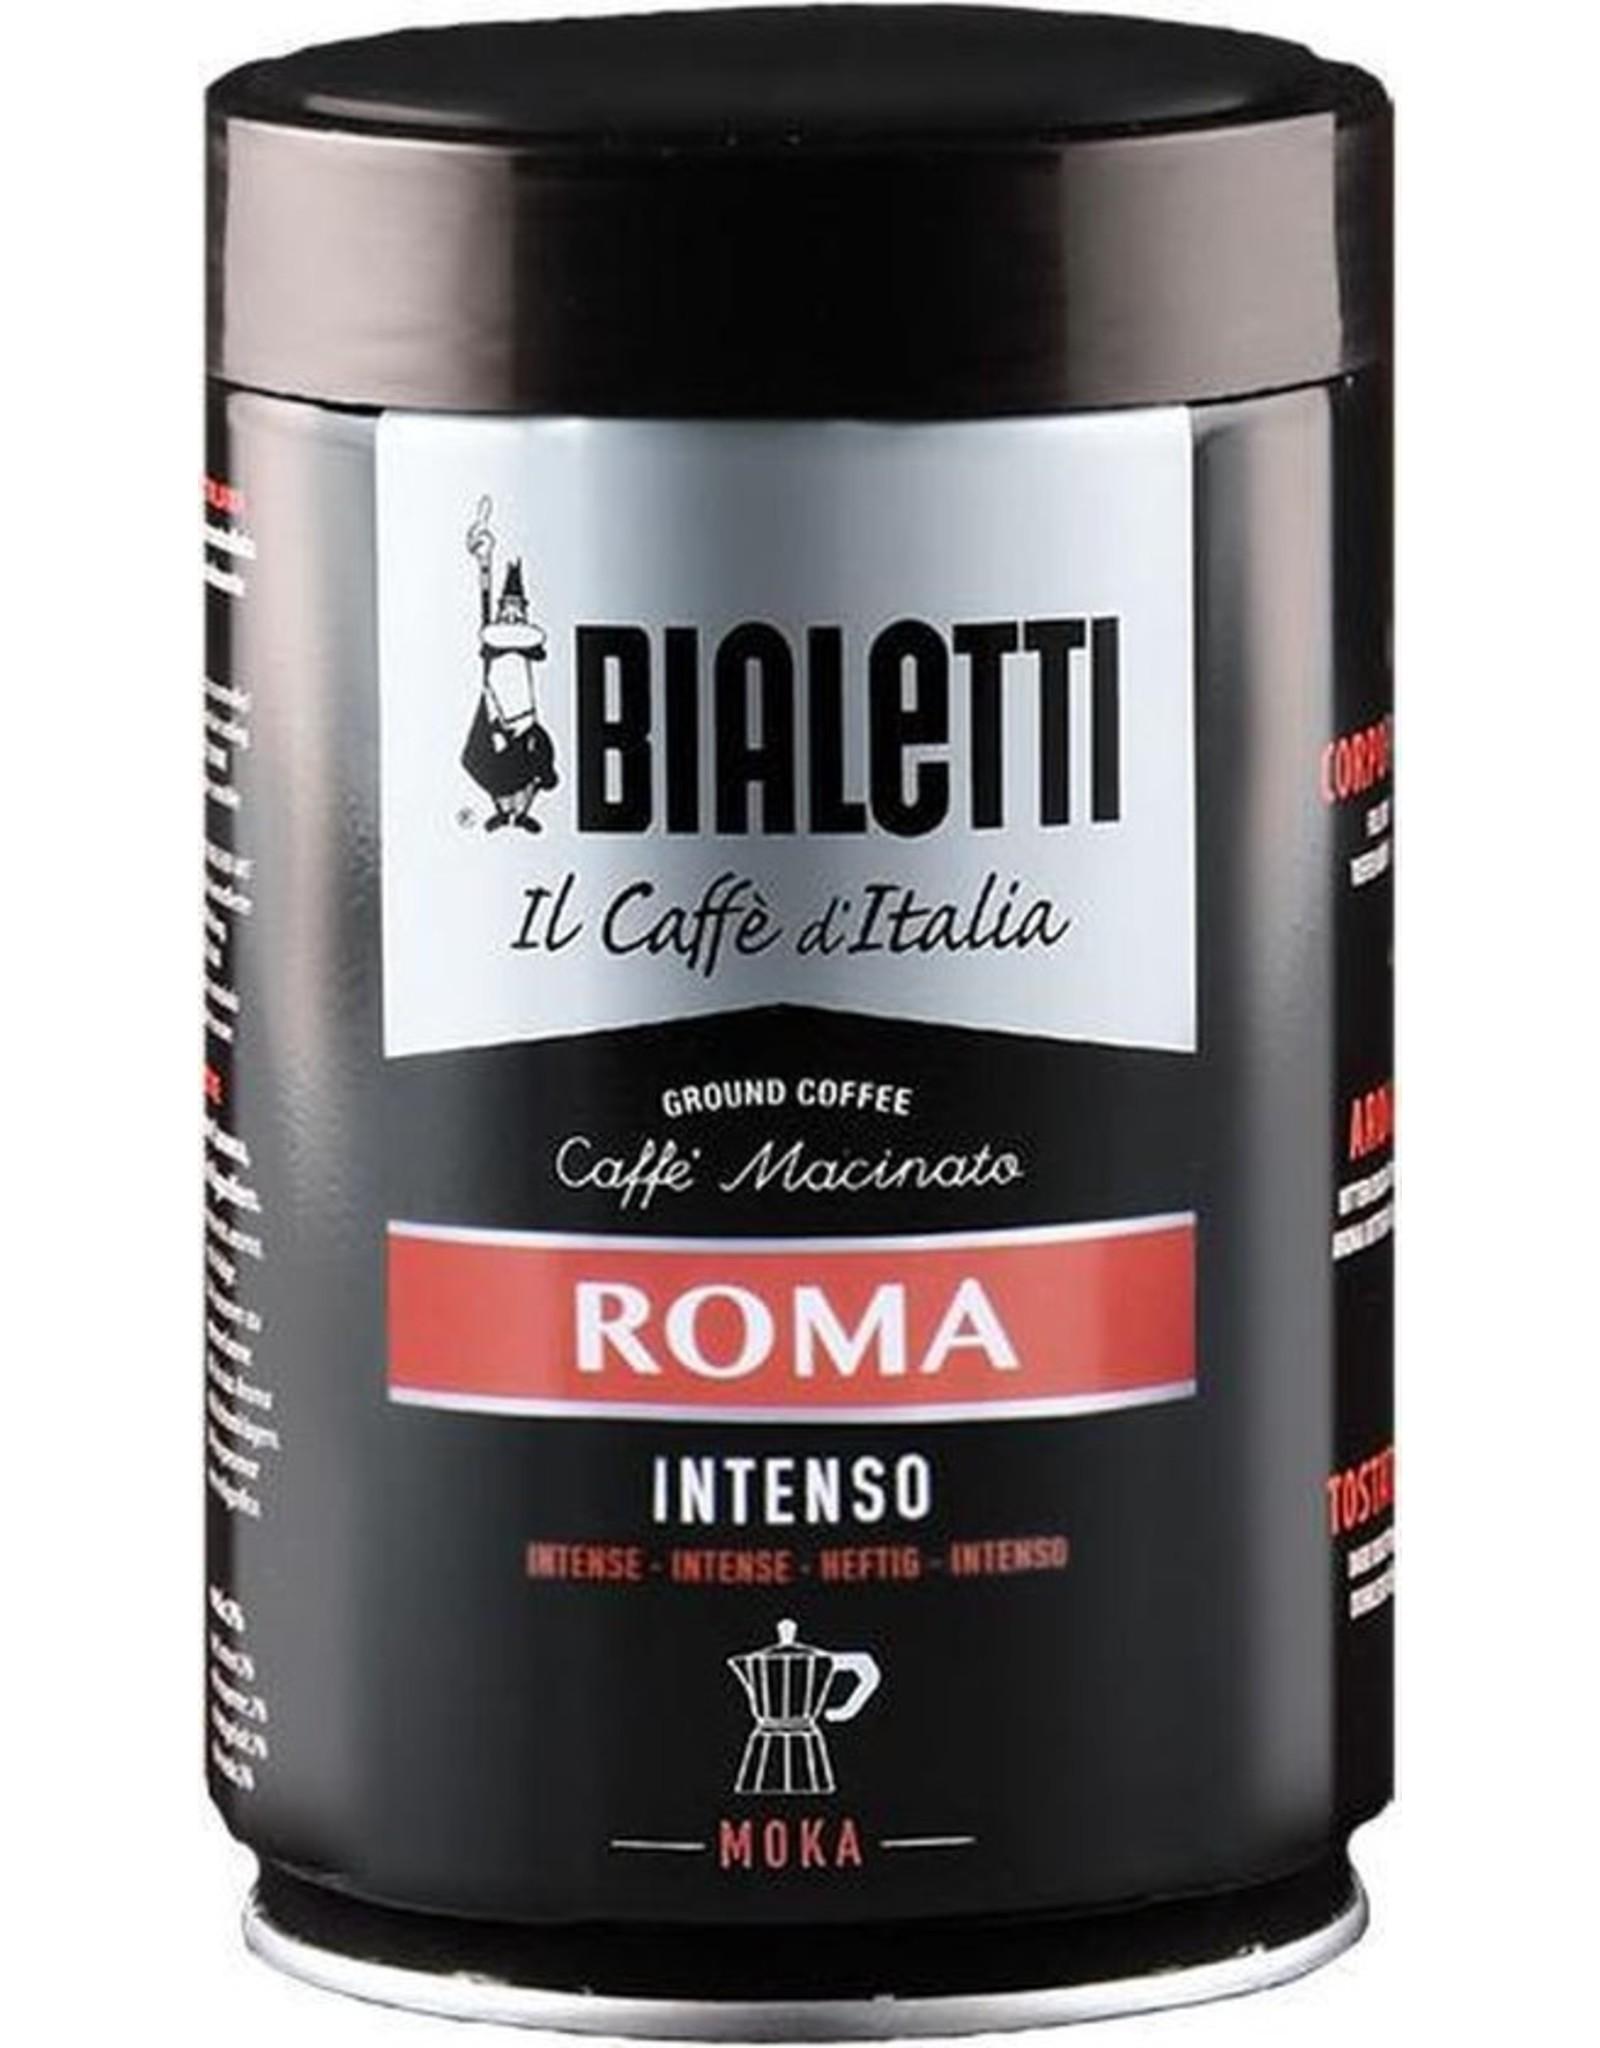 BIALETTI KOFFIE BIALETTI CAFFE MACINATO 250GR ROMA